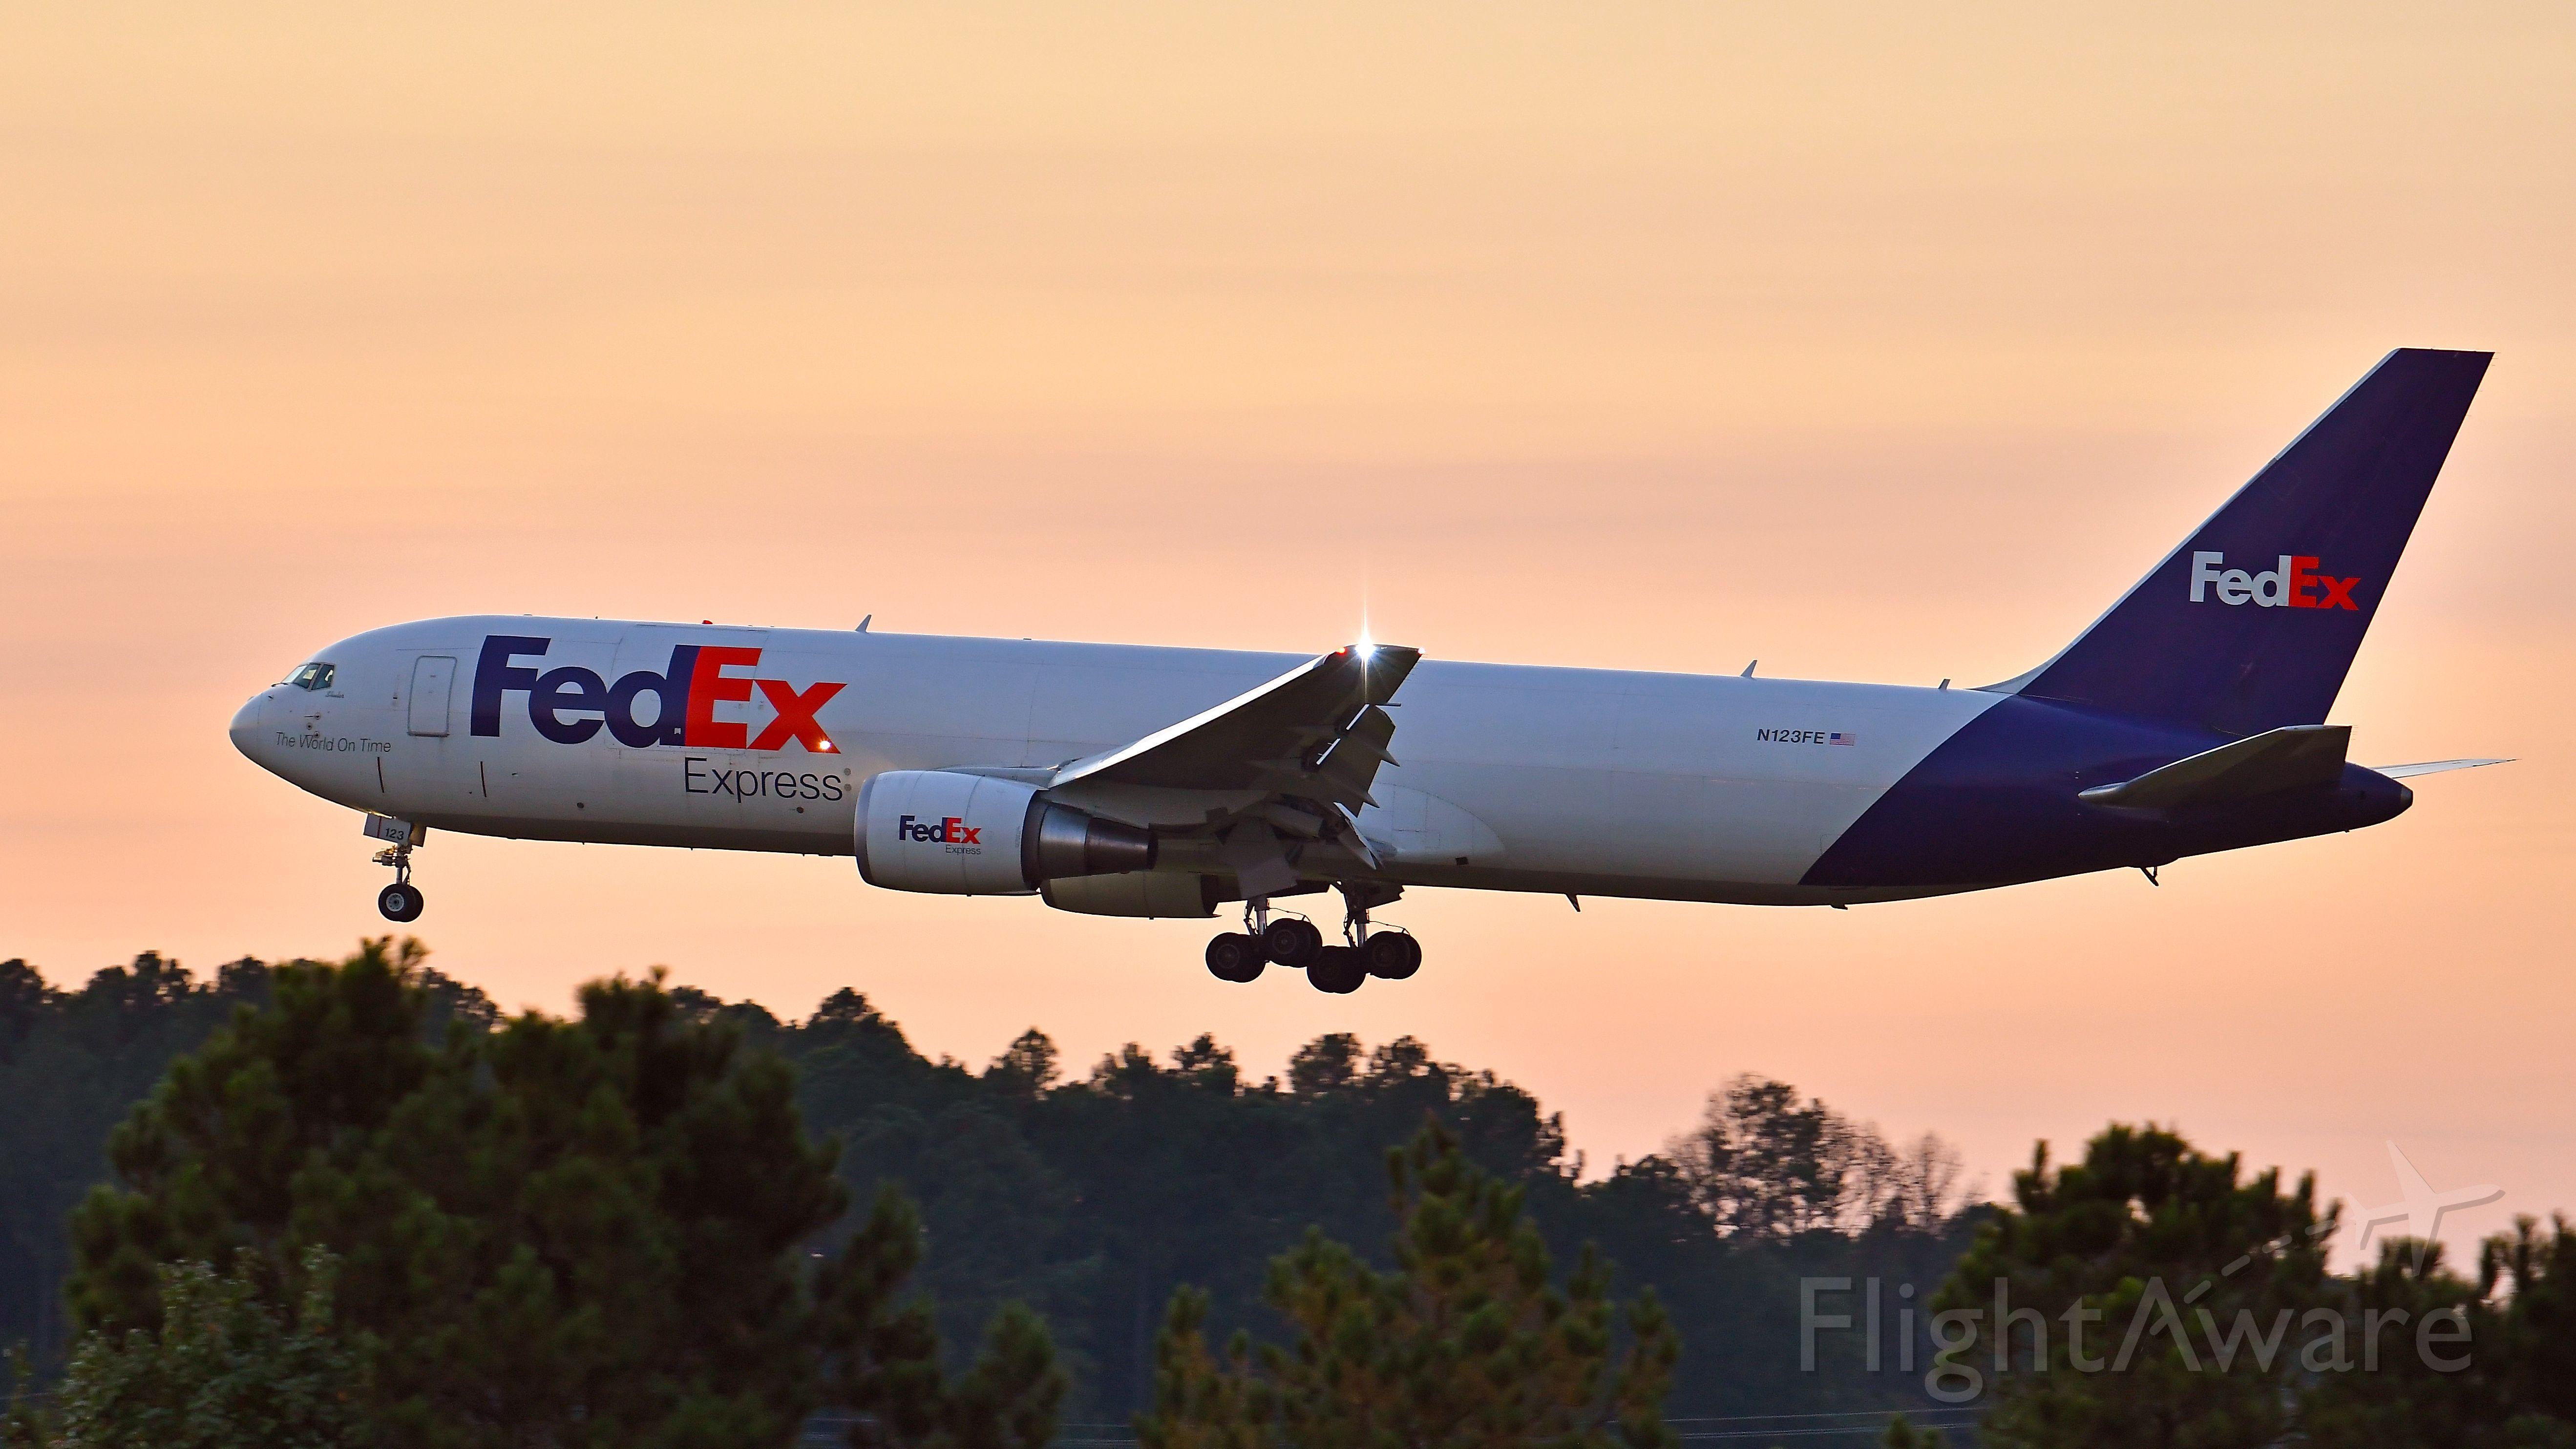 BOEING 767-300 (N123FE) - FedEx Boeing 767-300 (N123FE) arrives KRDU Rwy 23R on 10/07/2020 at 6:56 pm.